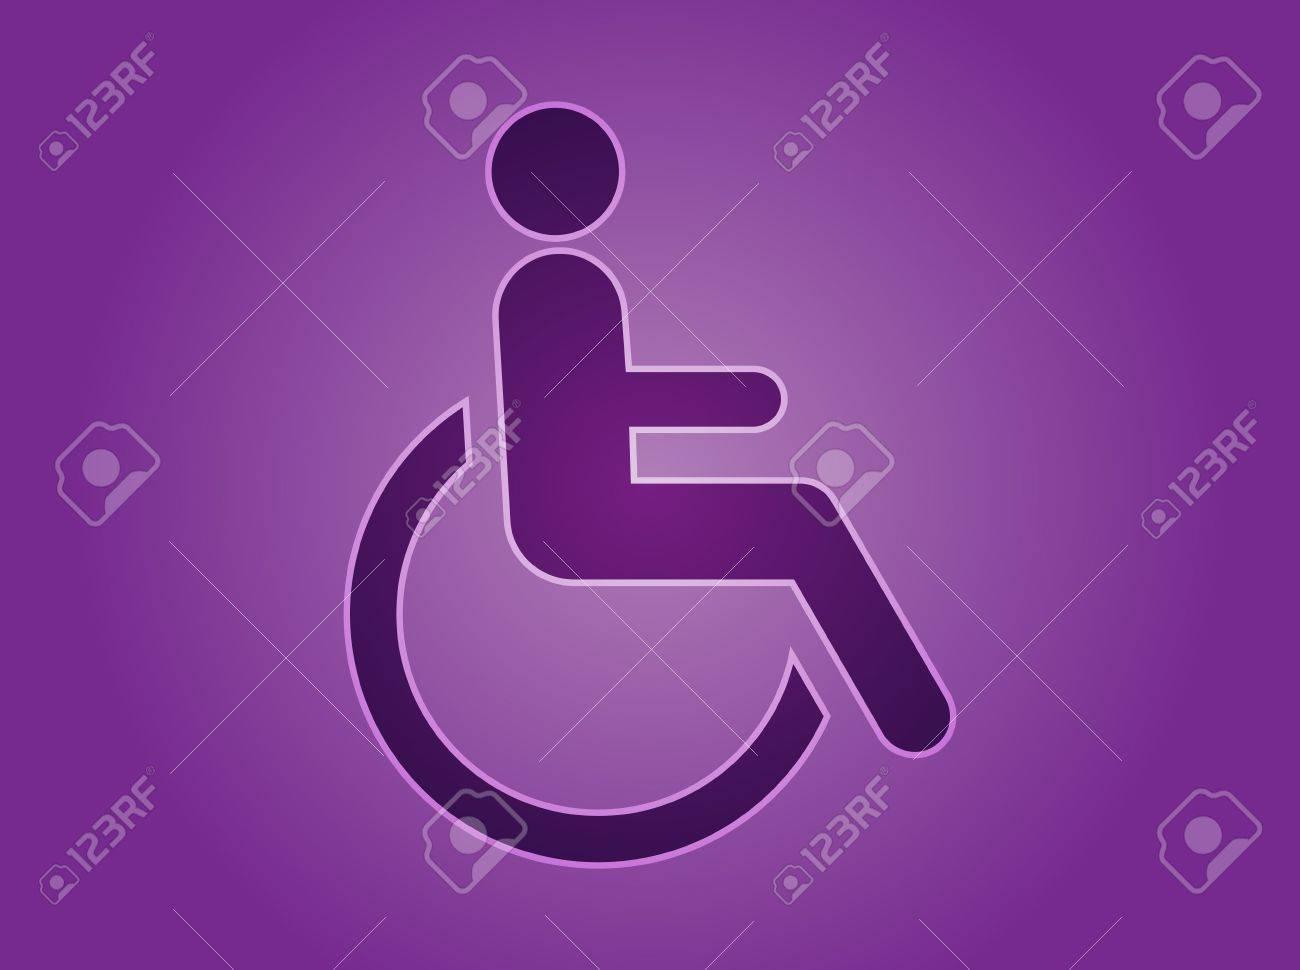 Handicap Symbol Illustration Icon Of Wheelchair Clipart Stock ...